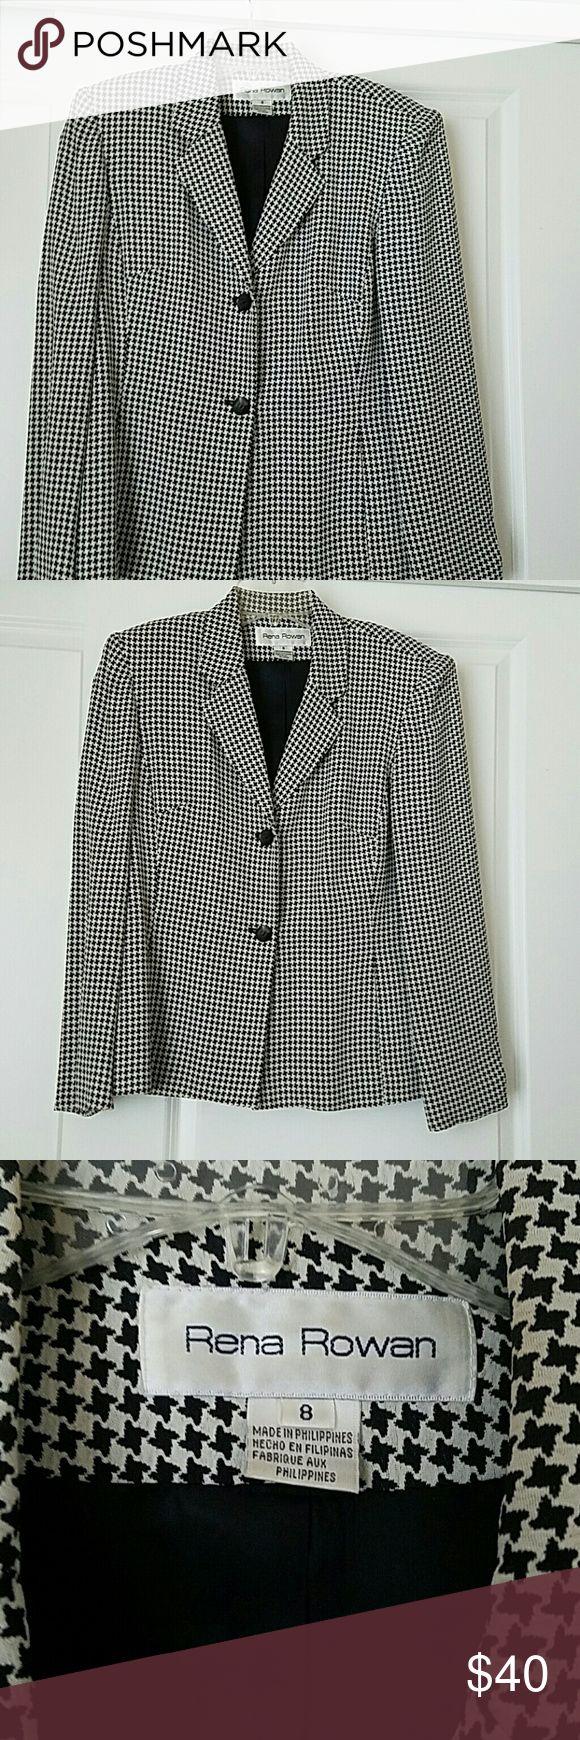 Selling this Checkered Blazer on Poshmark! My username is: debbiejager. #shopmycloset #poshmark #fashion #shopping #style #forsale #Rena Rowan #Jackets & Blazers